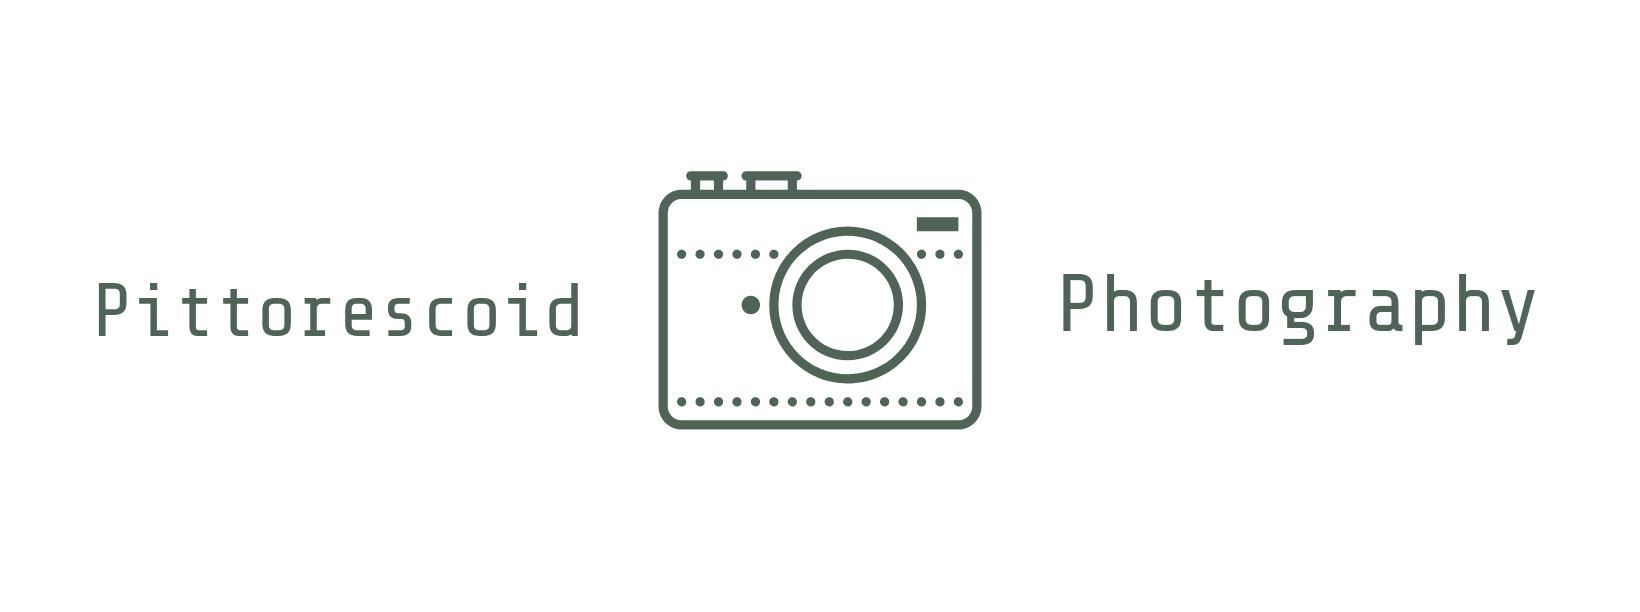 Pittorescoid Phtography